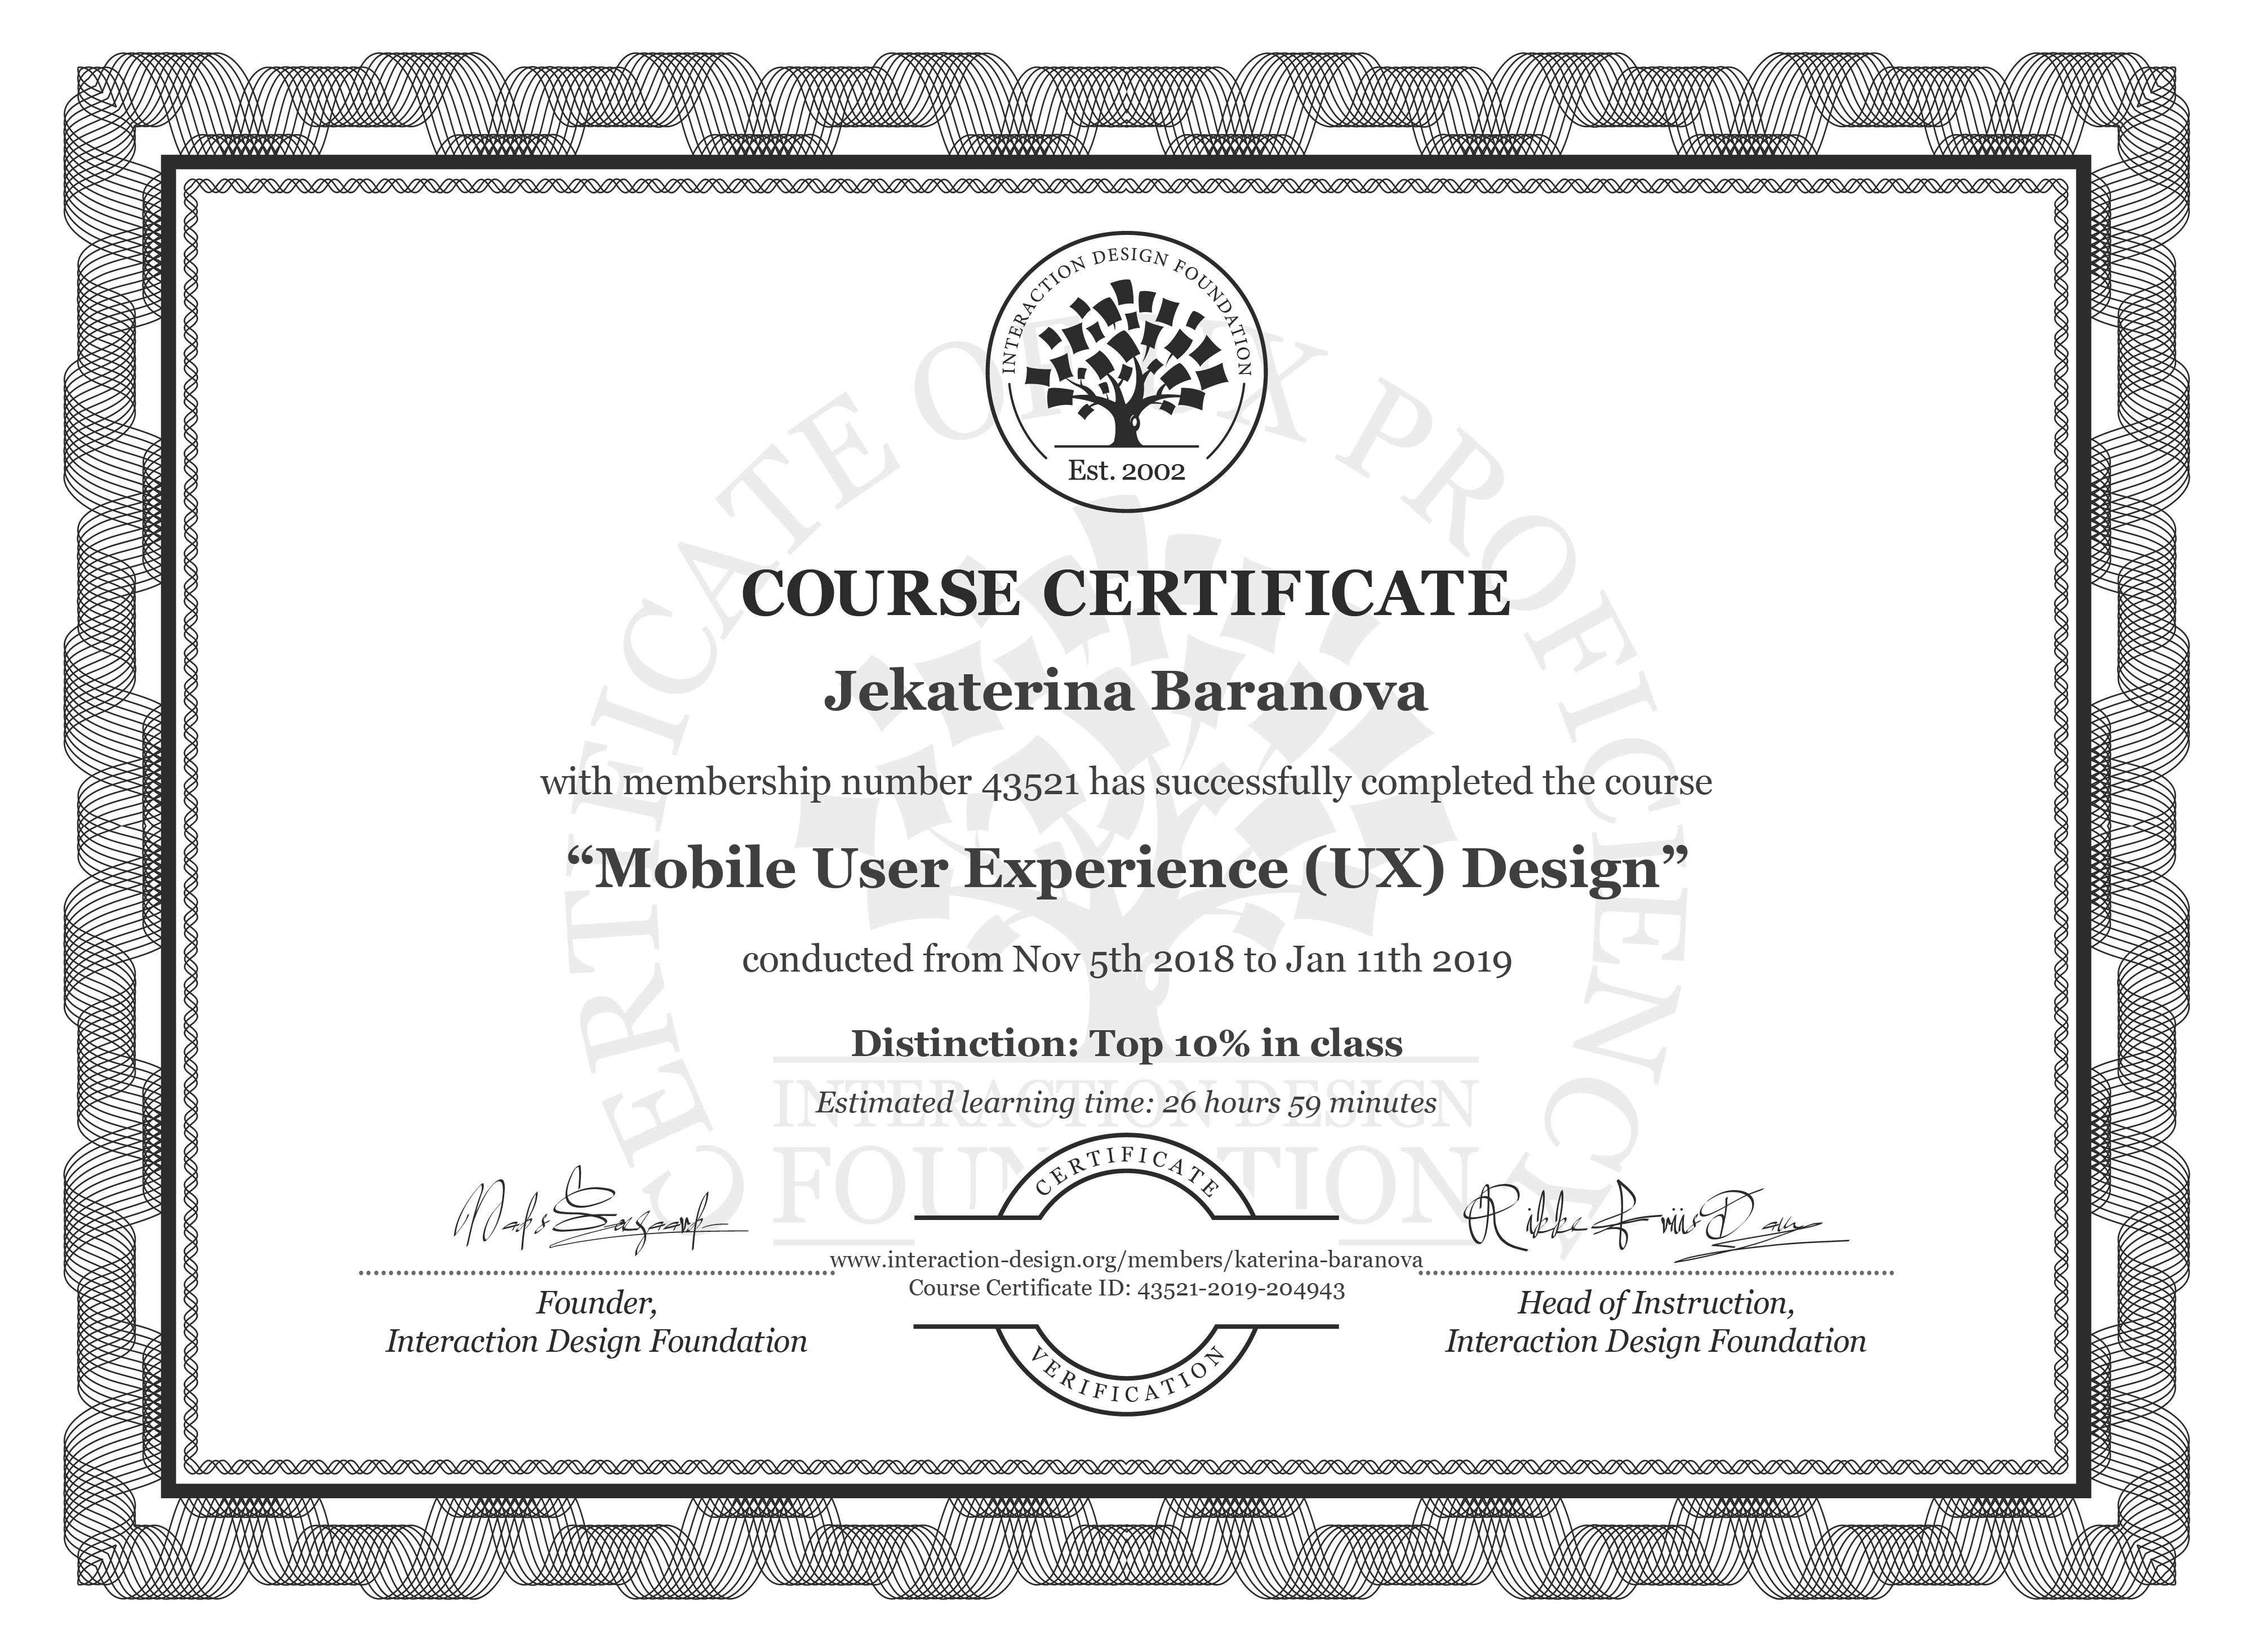 Jekaterina Baranova: Course Certificate - Mobile User Experience (UX) Design